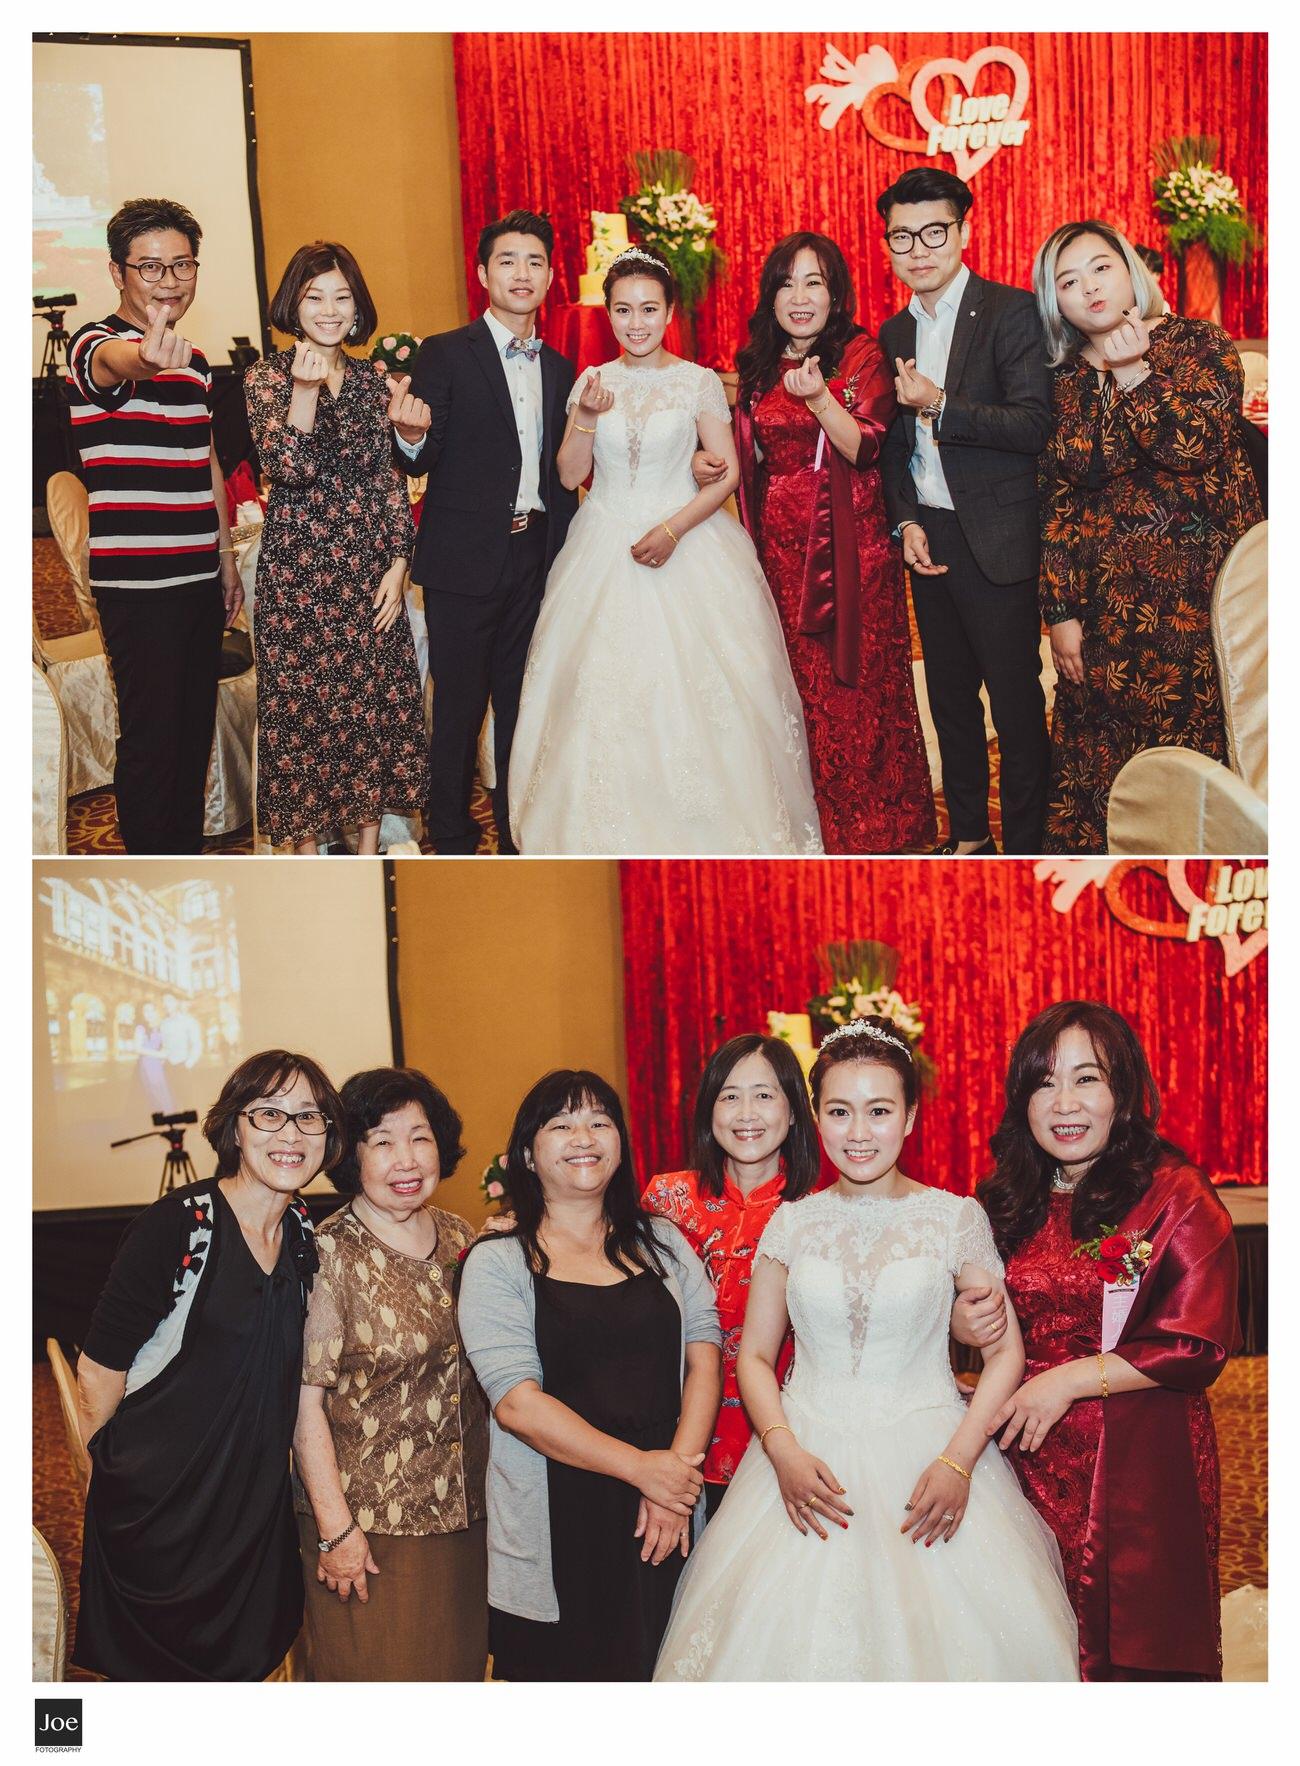 sunworld-dynasty-hotel-taipei-wedding-photo-joe-fotography-angel-jay-069.jpg